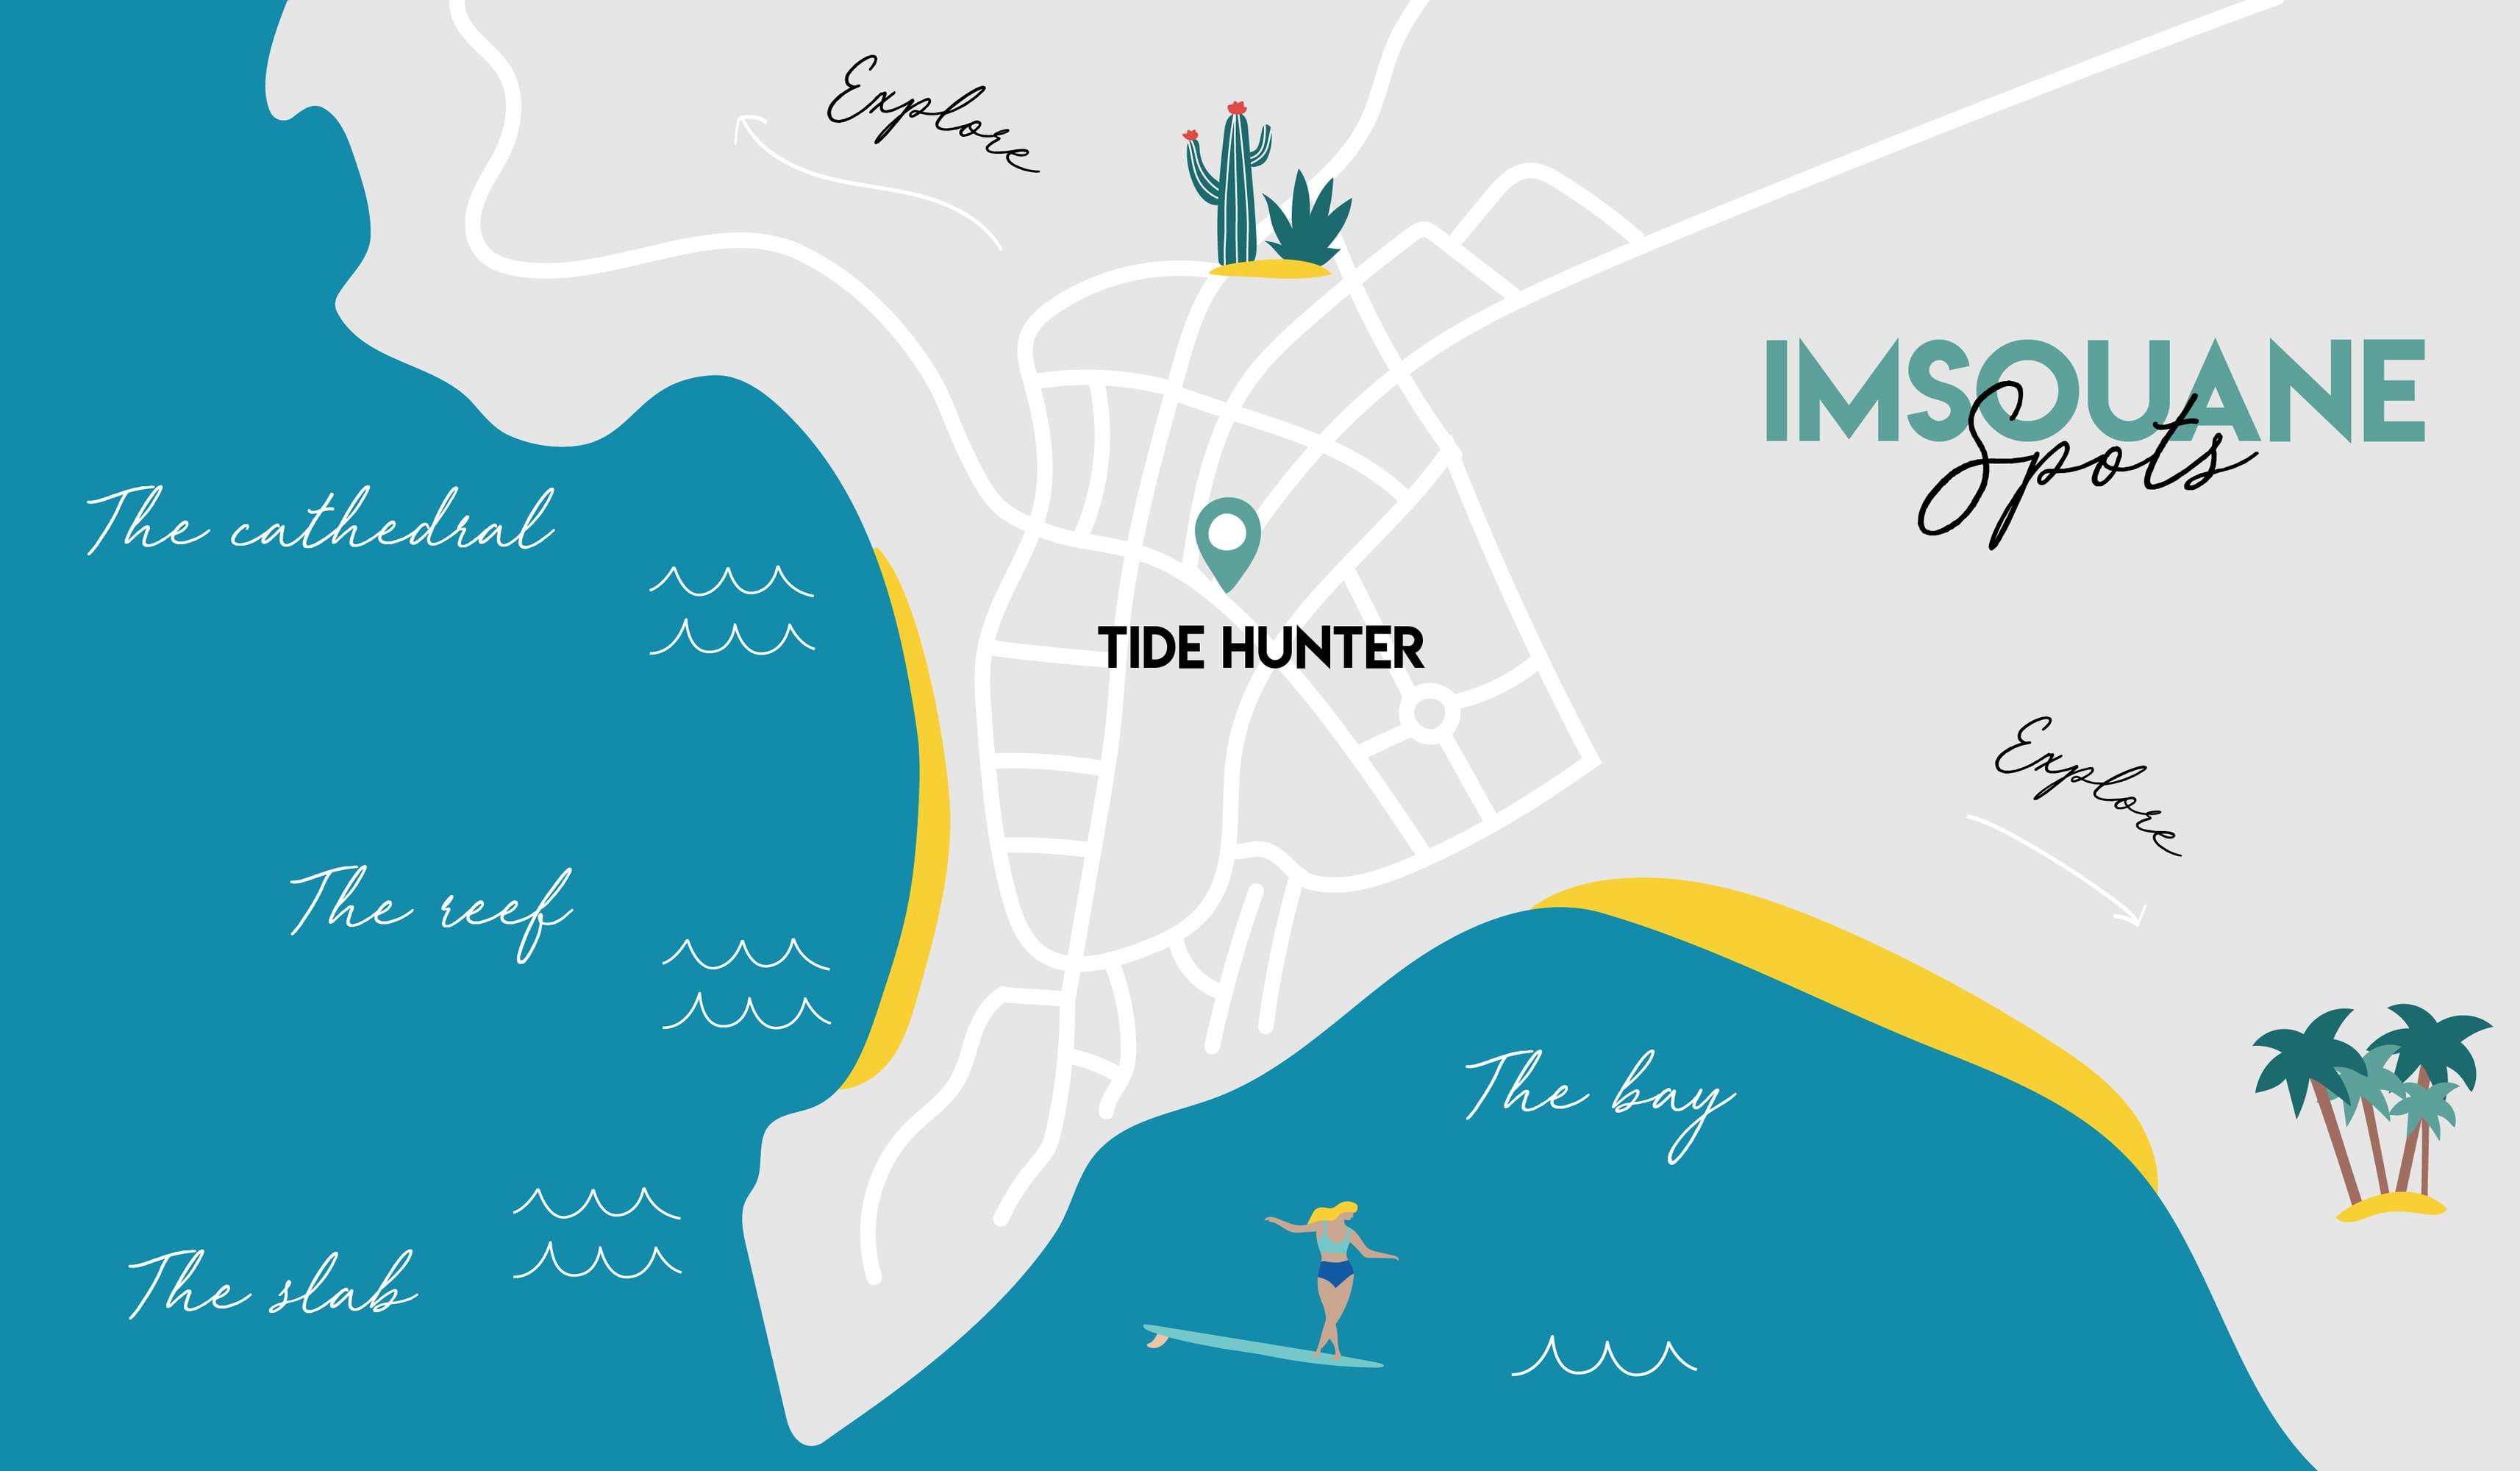 Imsouane Surf Spot